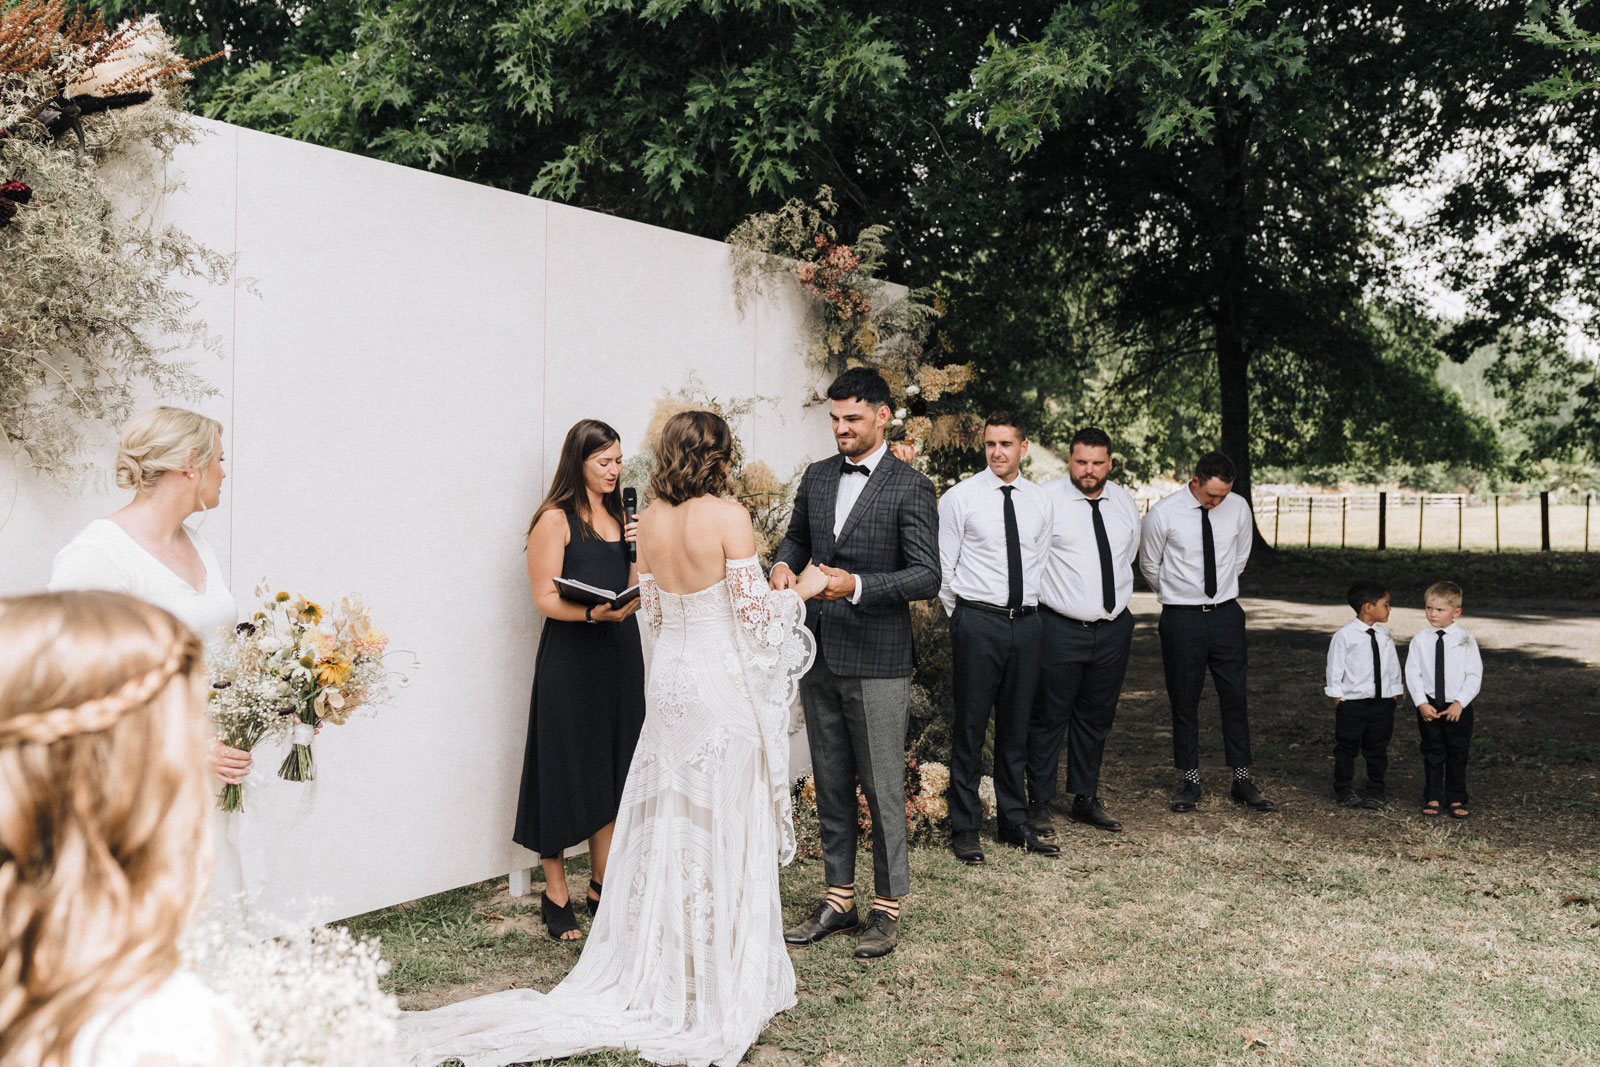 newfound-l-d-tauranga-wedding-photographers-097